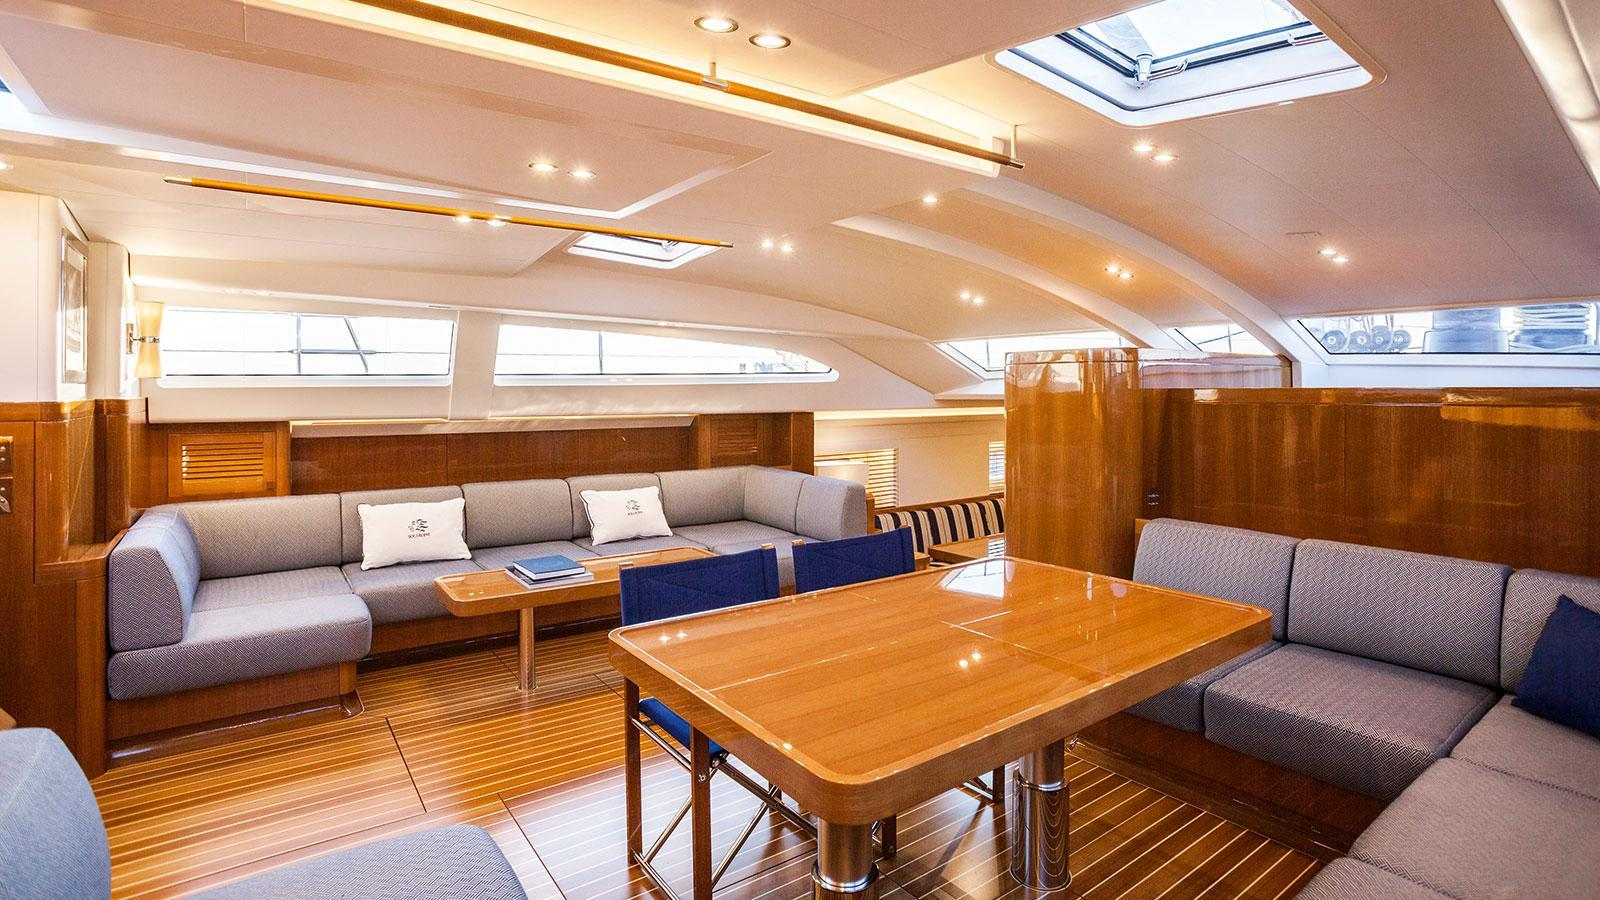 solleone-motor-yacht-nautors-swan-115-s-2015-35m-saloon